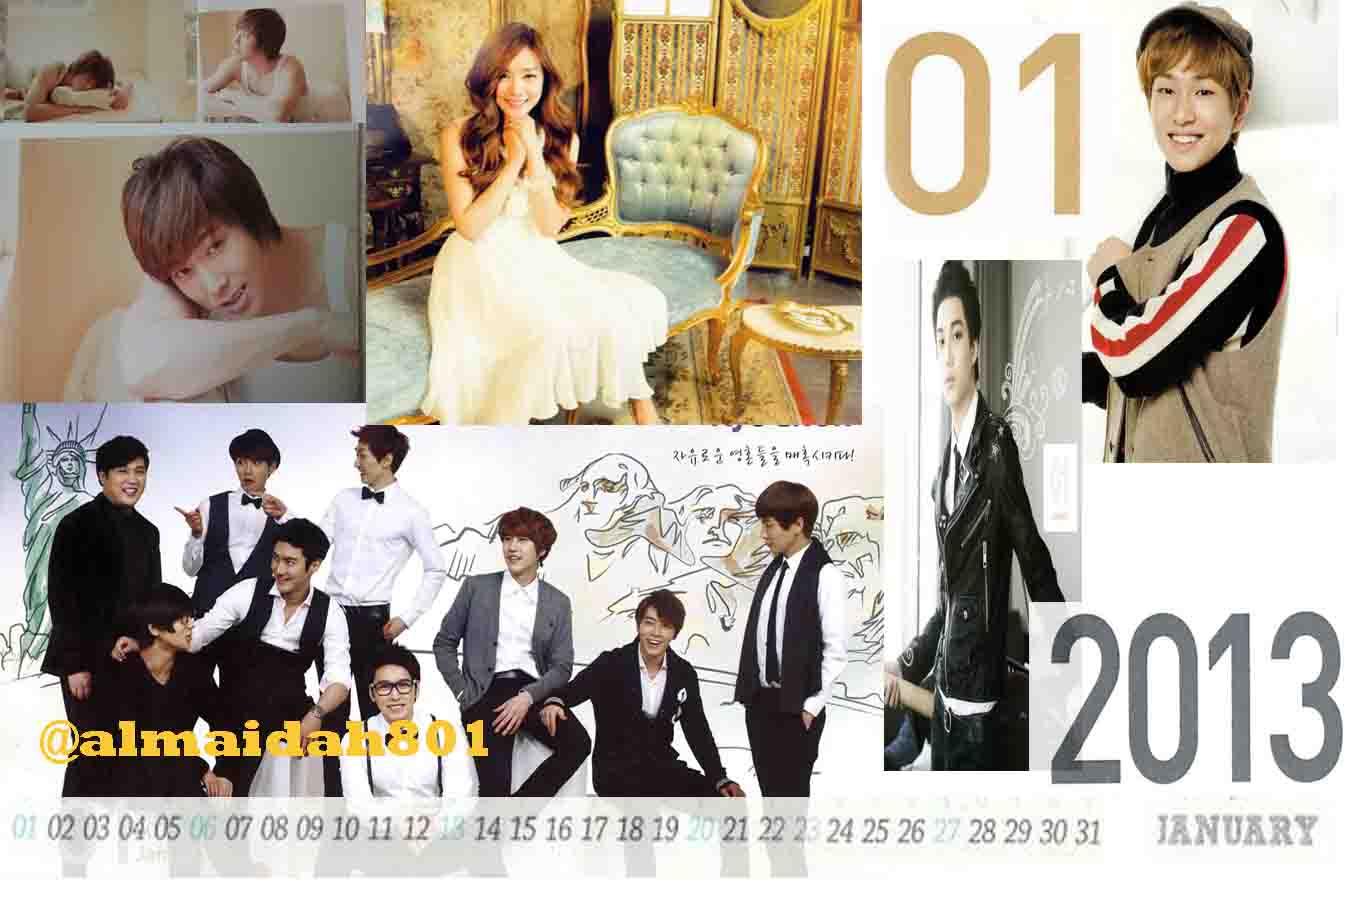 guten tag preview smtown calendar 2013 edited